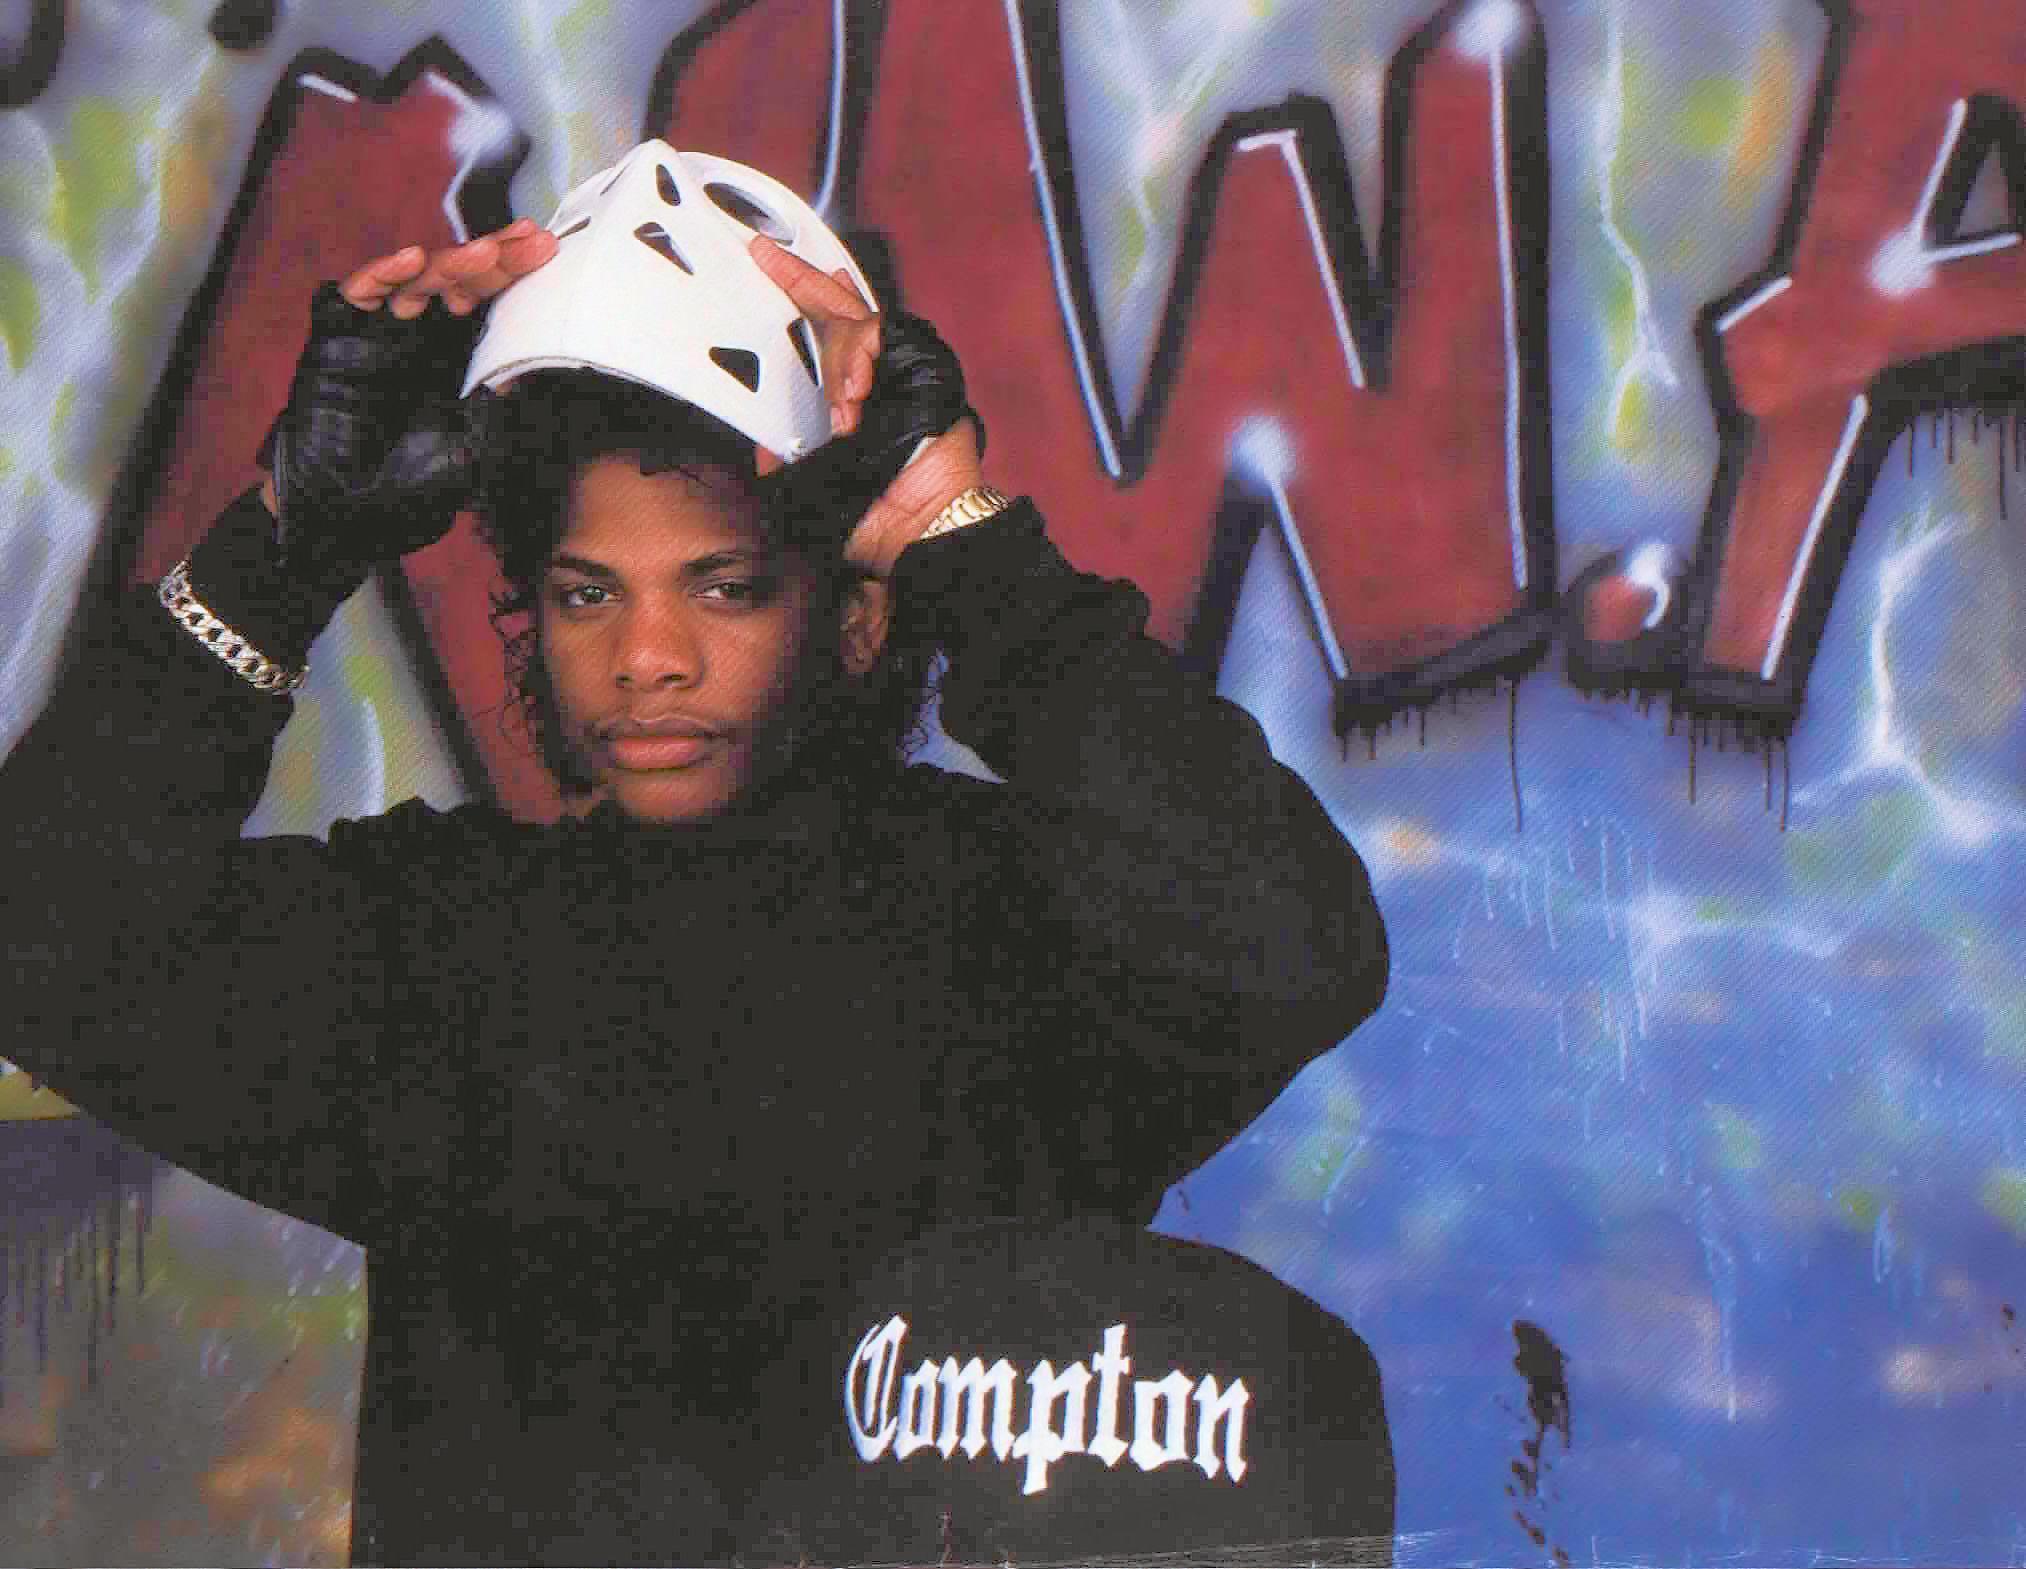 Eazy E nwa gangsta rapper rap hip hop eazy-e weapon gun d ...